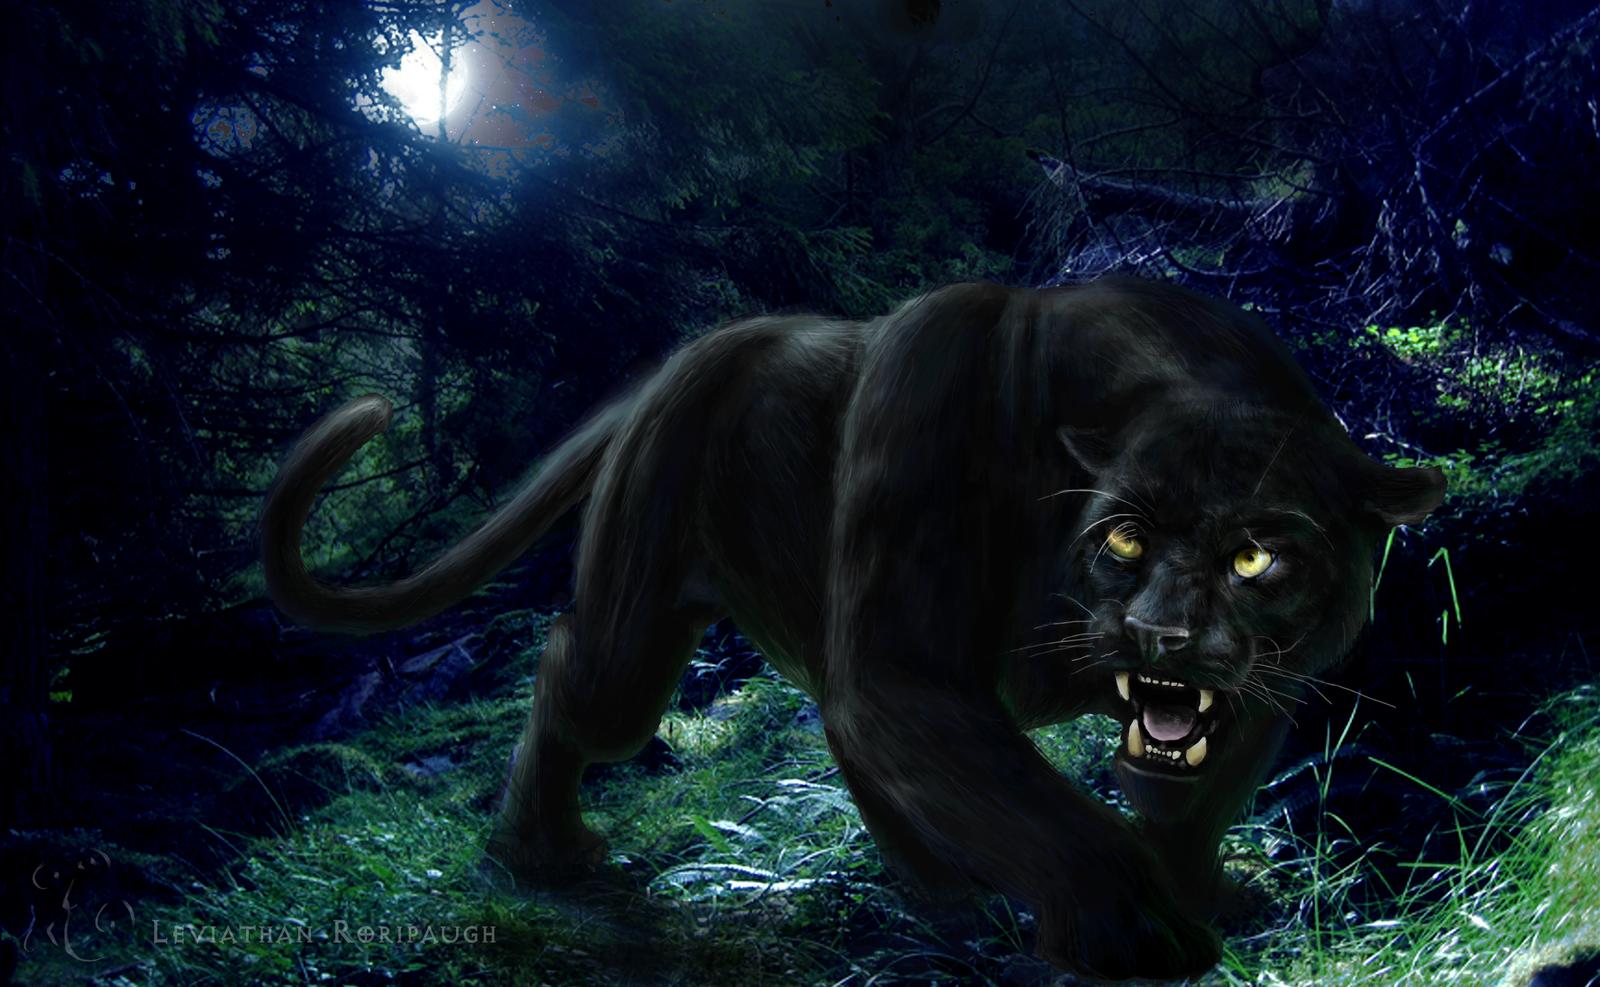 Black Panther Hd Wallpaper 3d Art Wallpaper Hd Free Dekstop 3d Art